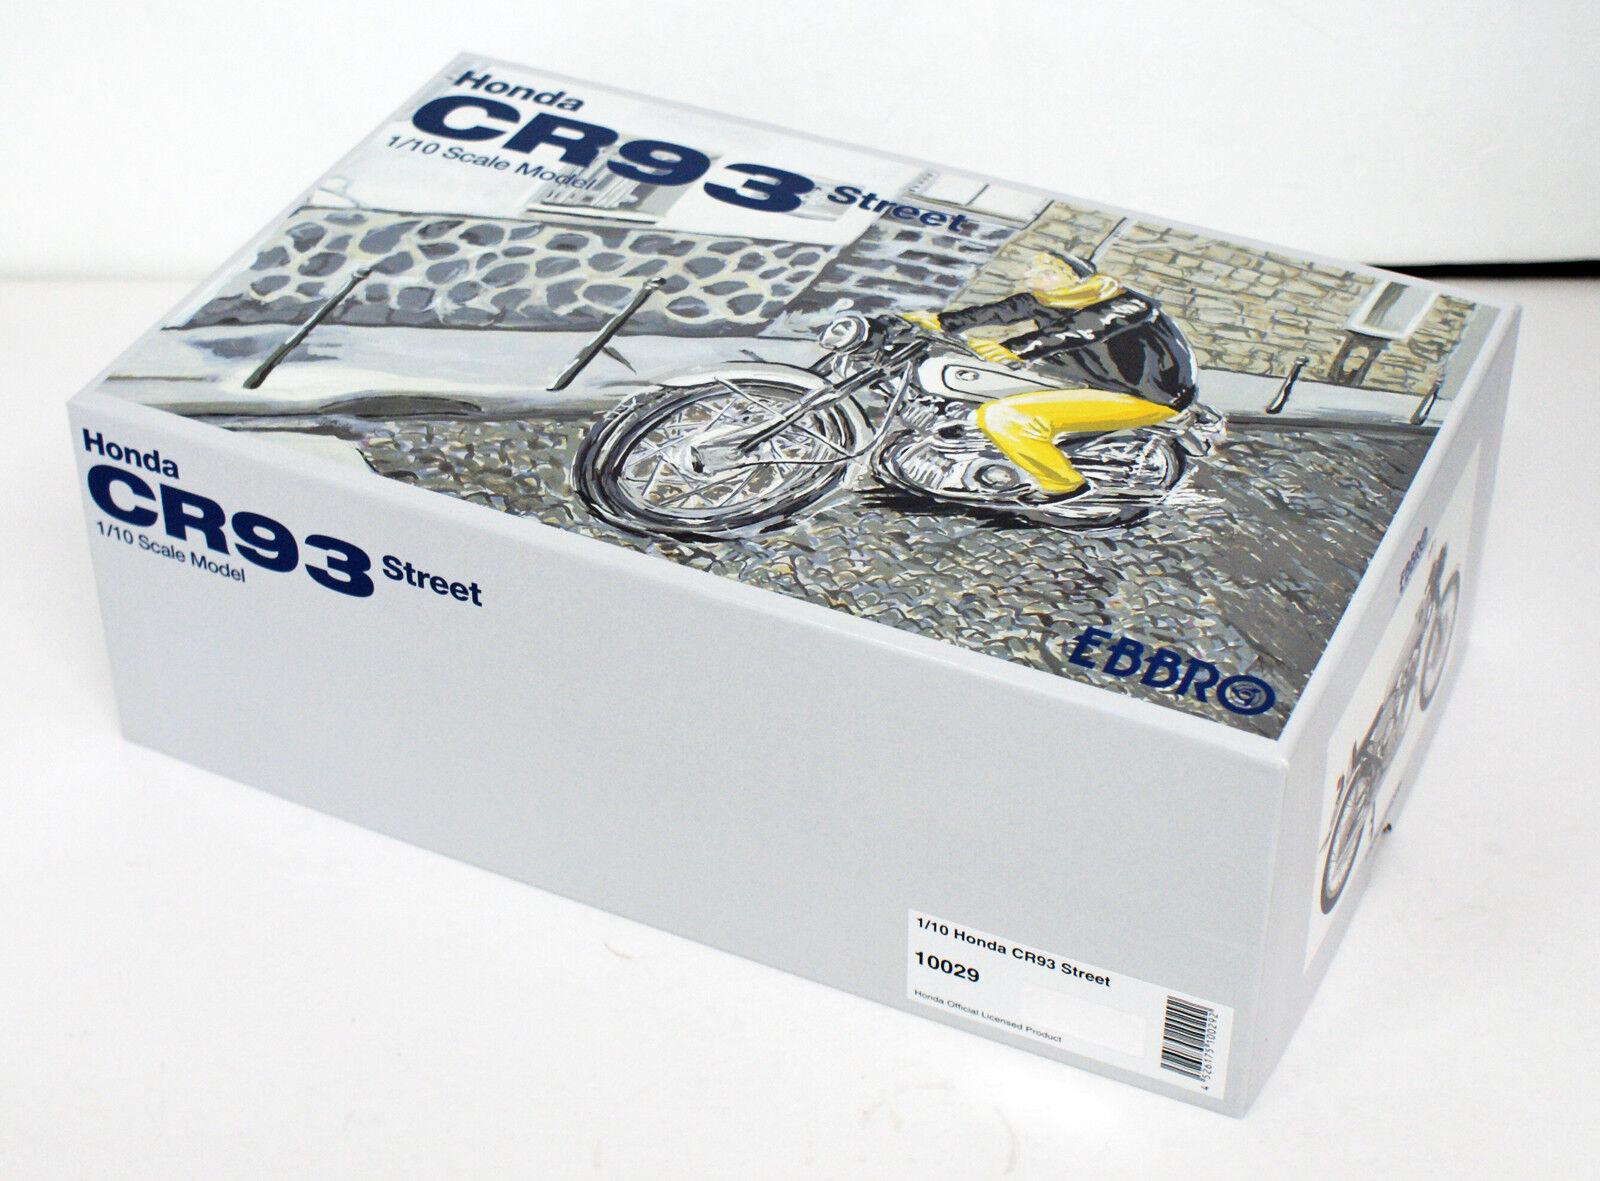 Ebbro 10029 Honda CR93 Street Bike (negro) Escala 1/10